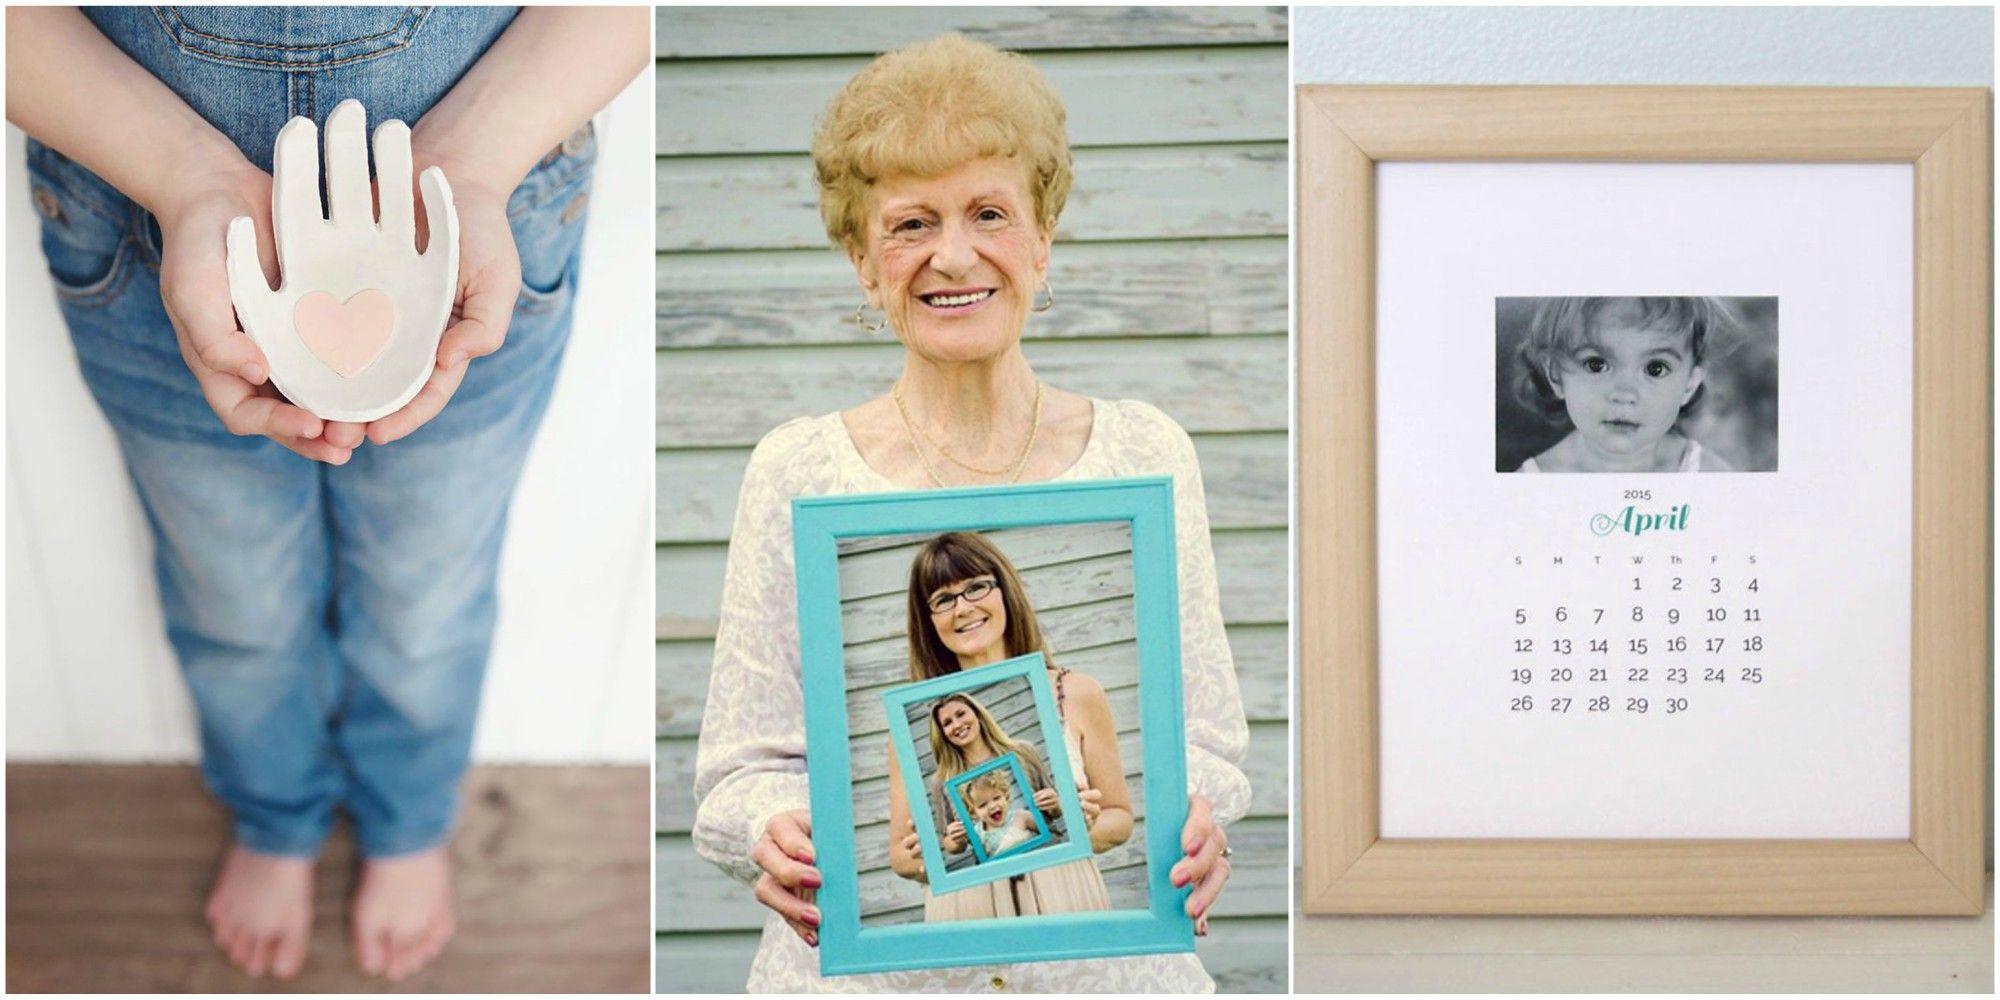 18 Best Diy Christmas Gifts For Grandma Crafts Grandma